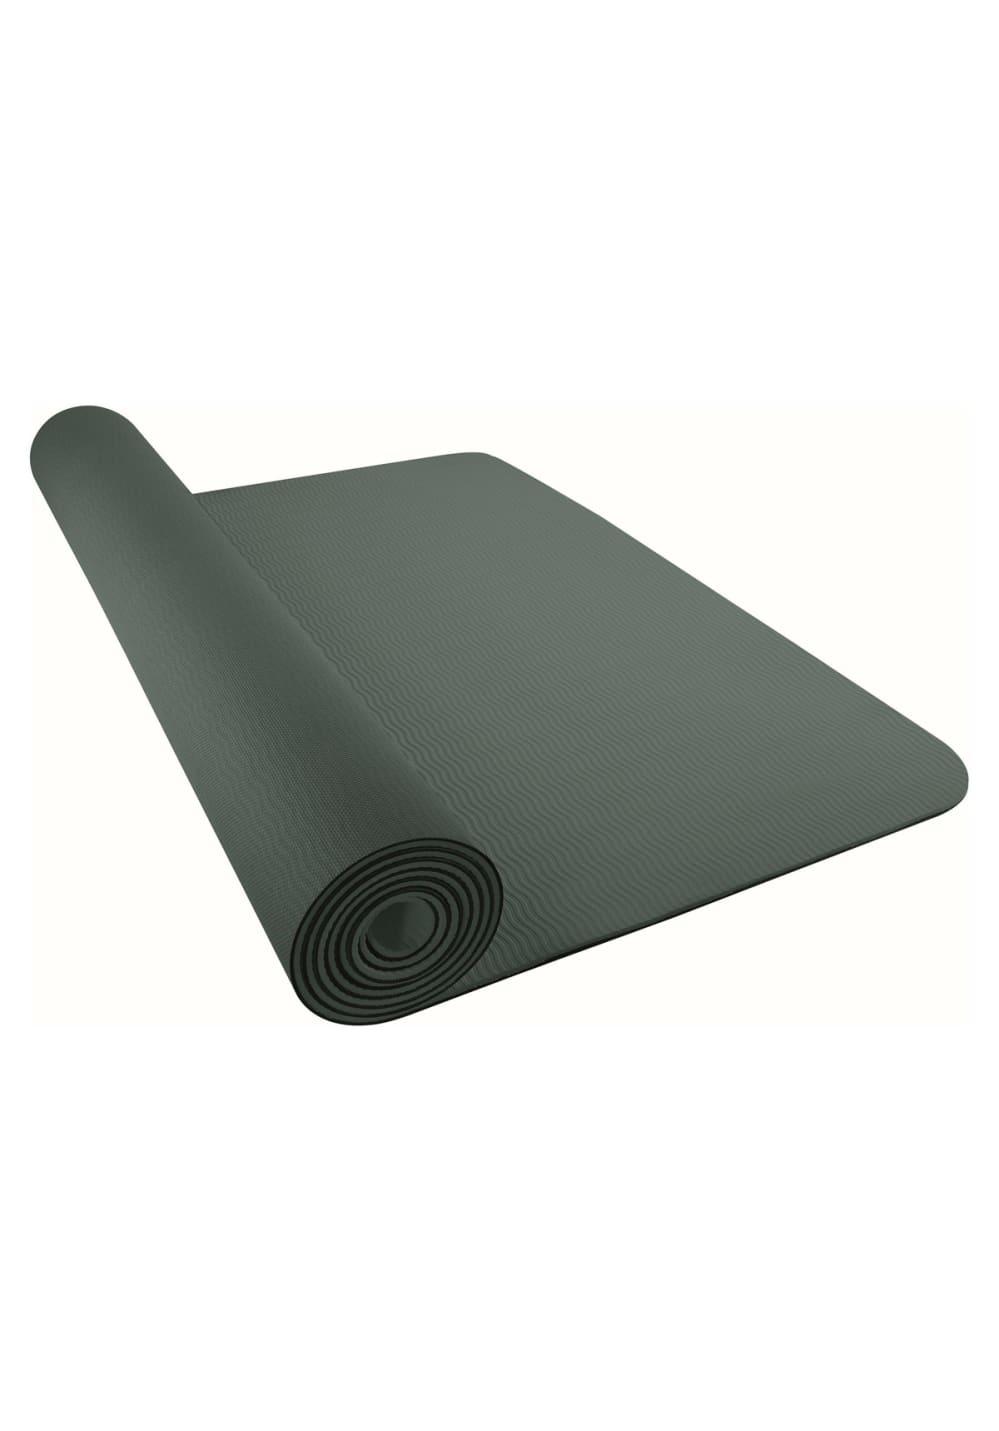 Nike Fundamental Yoga Mat 3mm Fitnesszubehör - ...